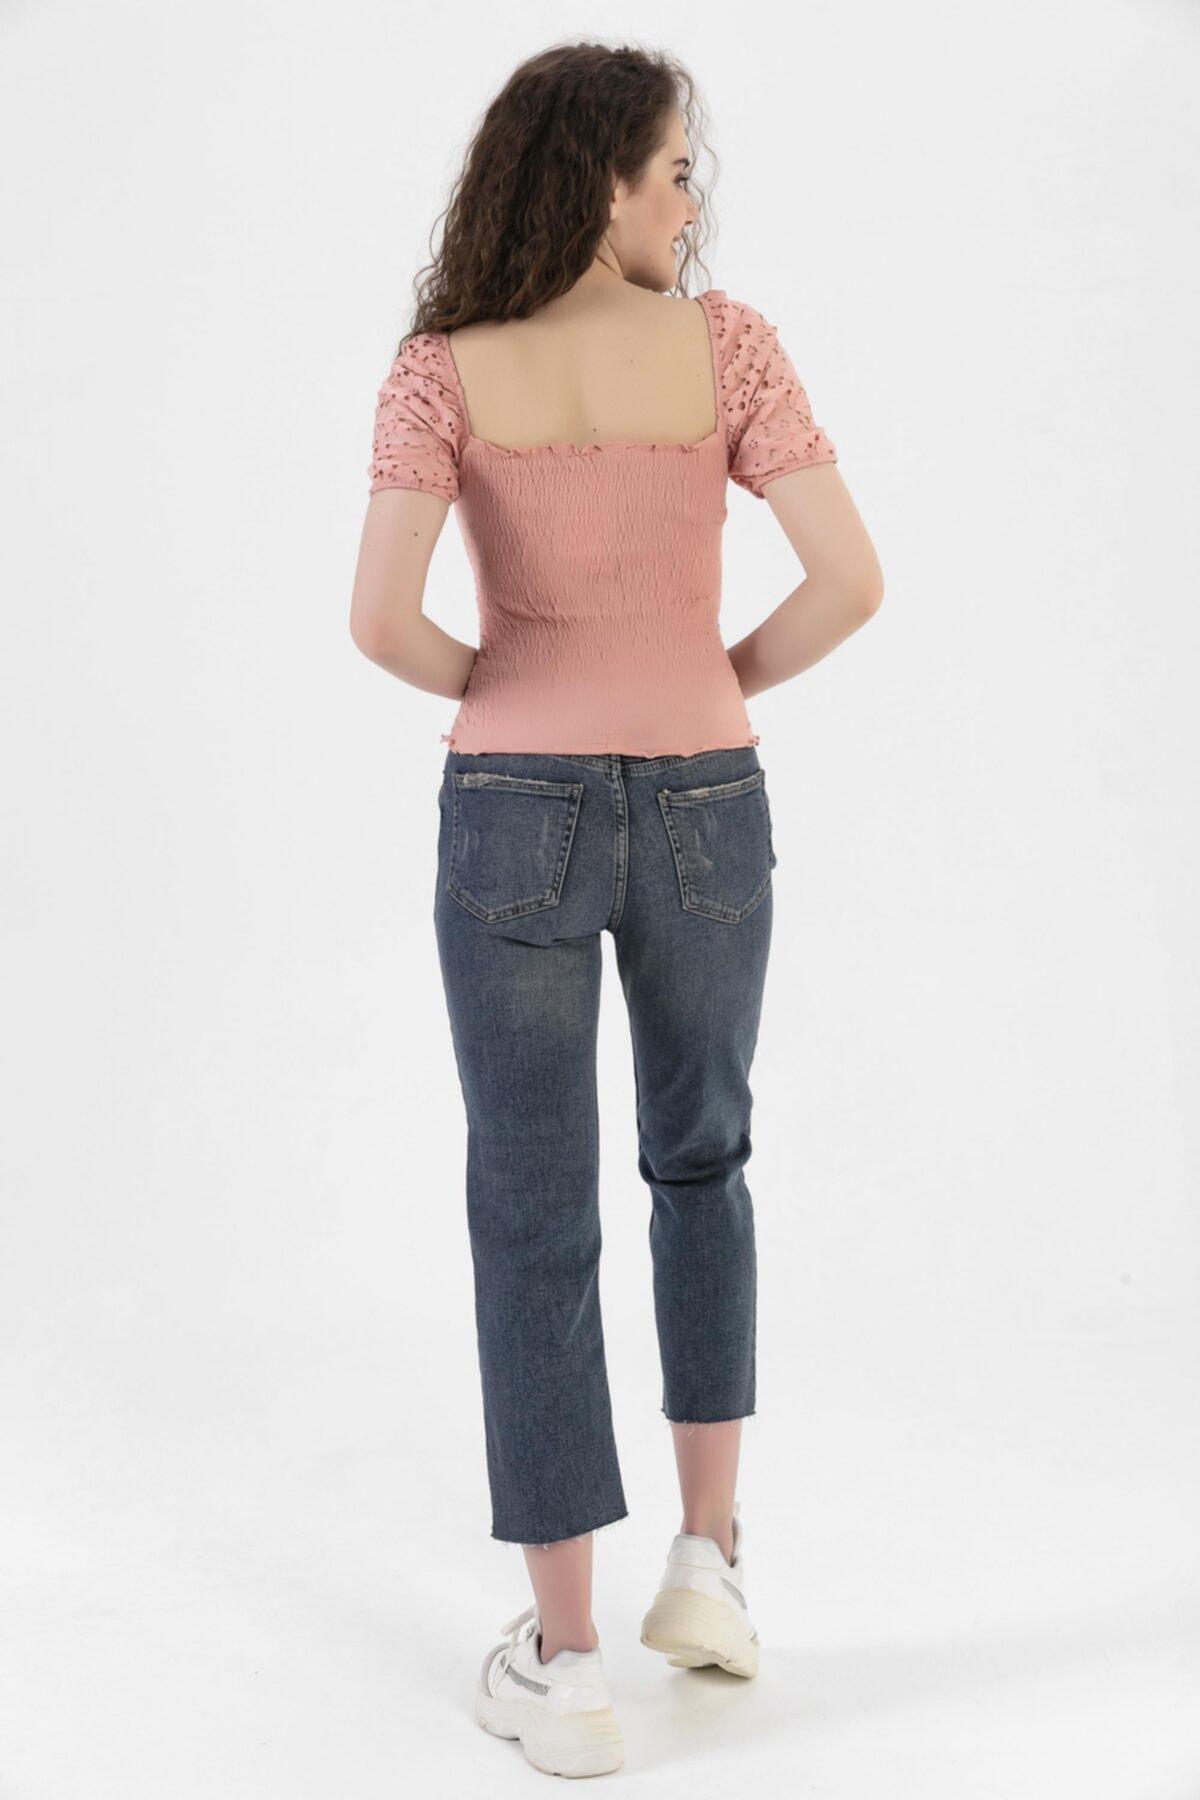 HerTon Pat Düğmeli Paça Detaylı High Waist Cropped Kot Pantolon 117-0077